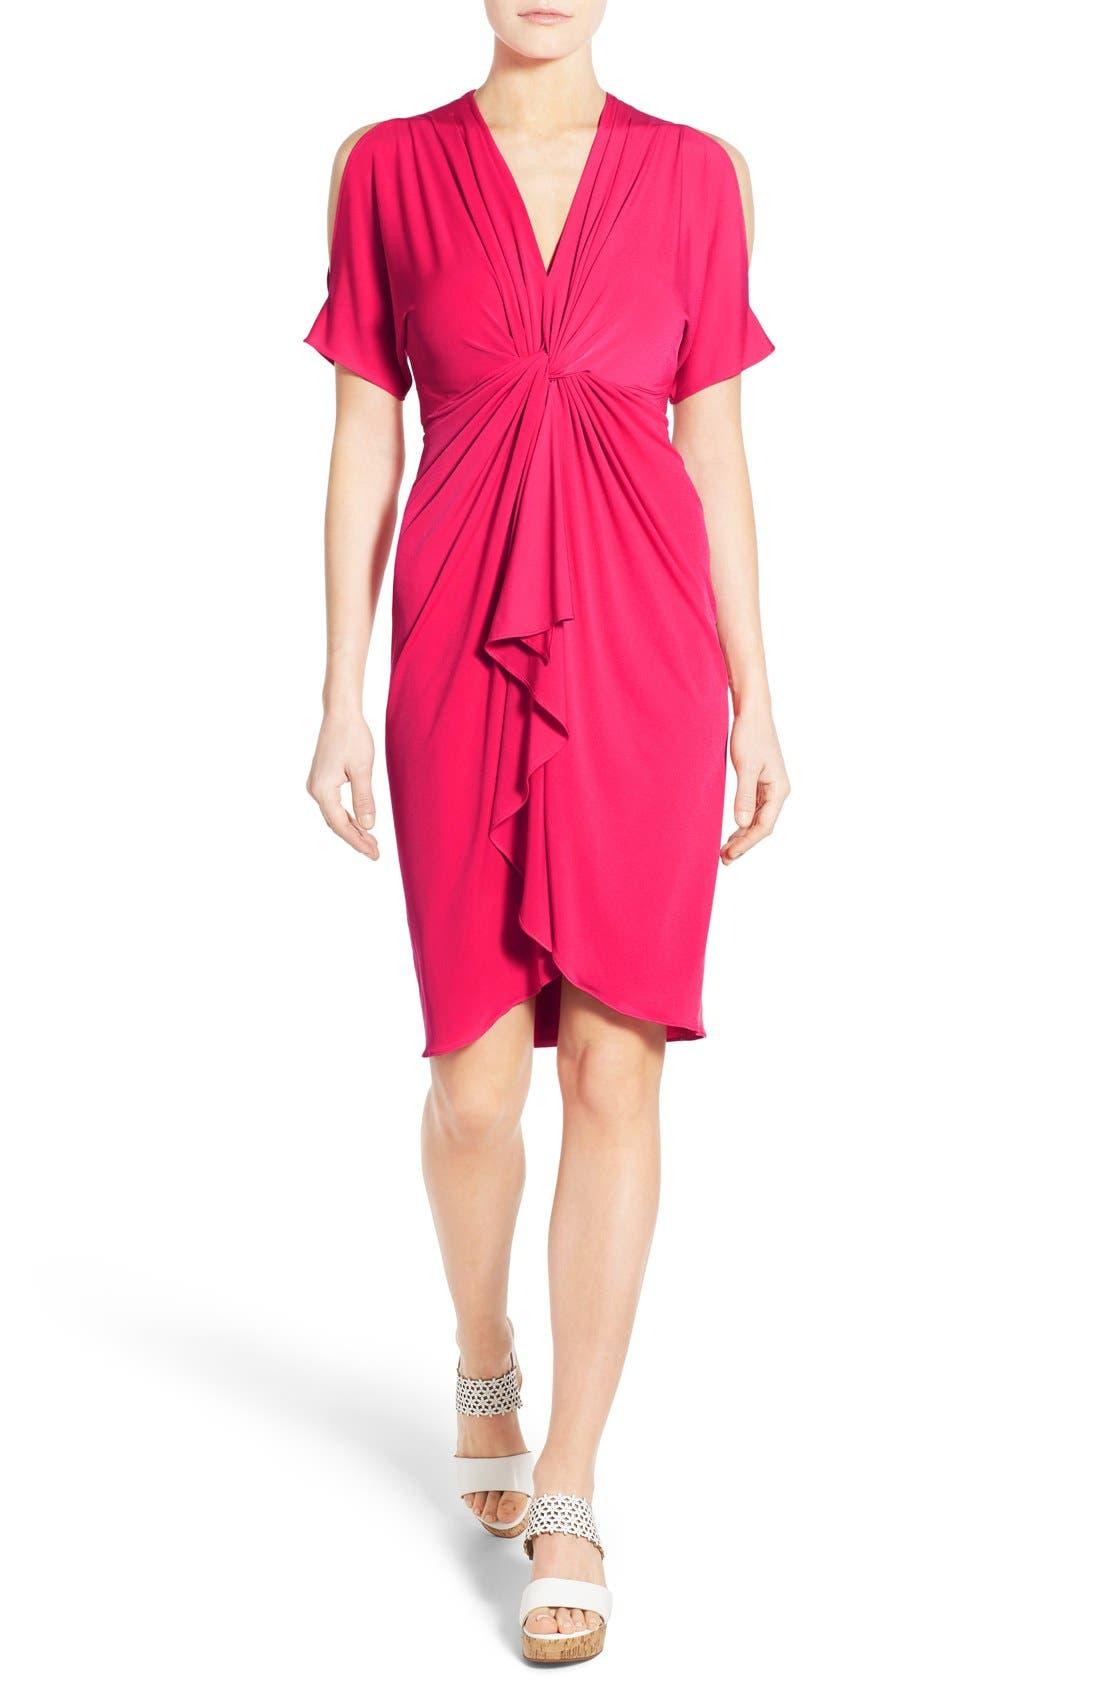 Main Image - Catherine Catherine Malandrino 'Emily' Cold Shoulder Twist Front Dress